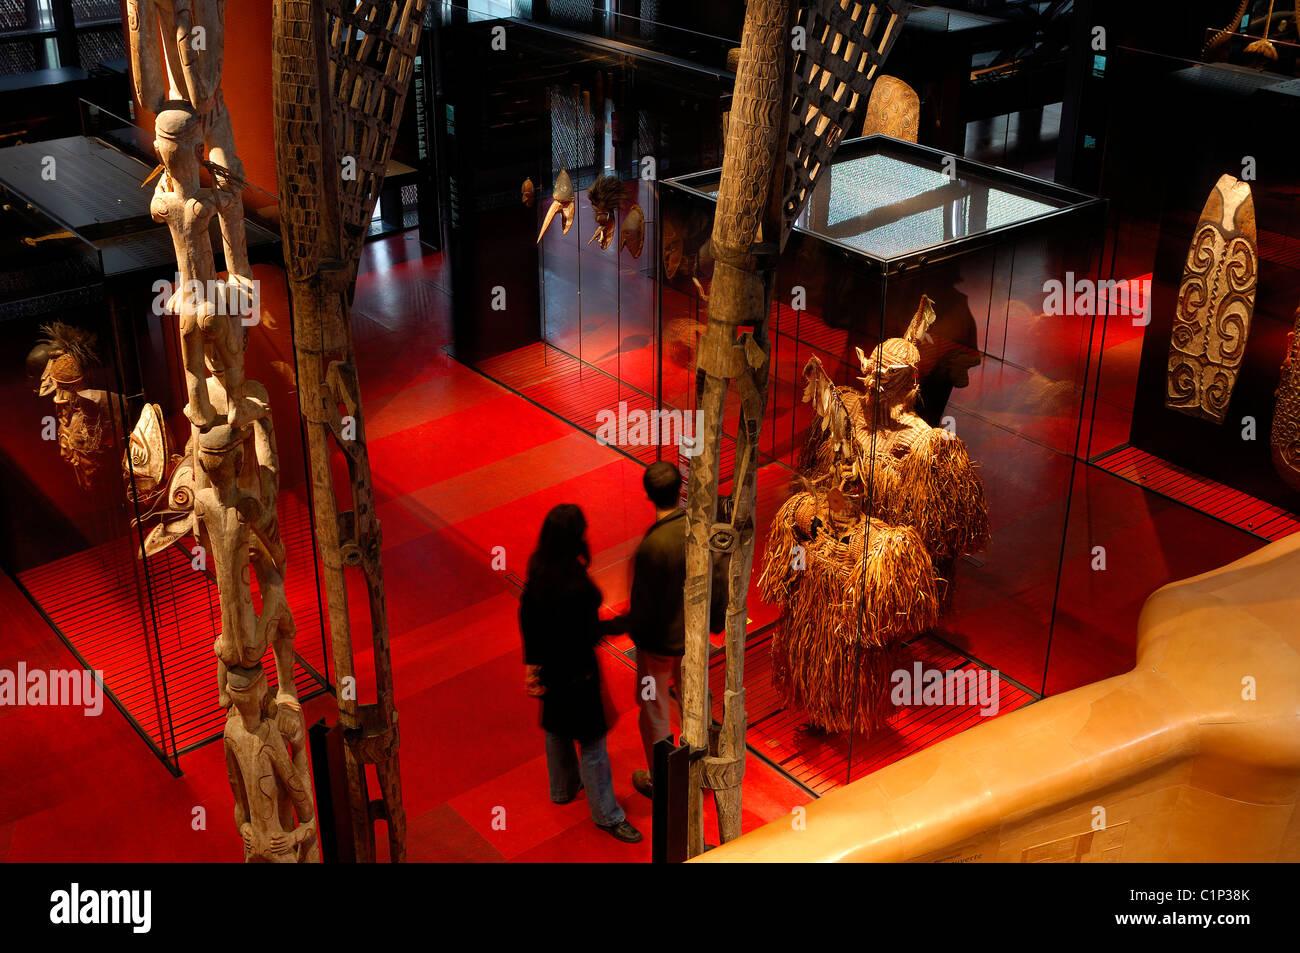 France, Paris, Musee du quai Branly, collections area - Stock Image